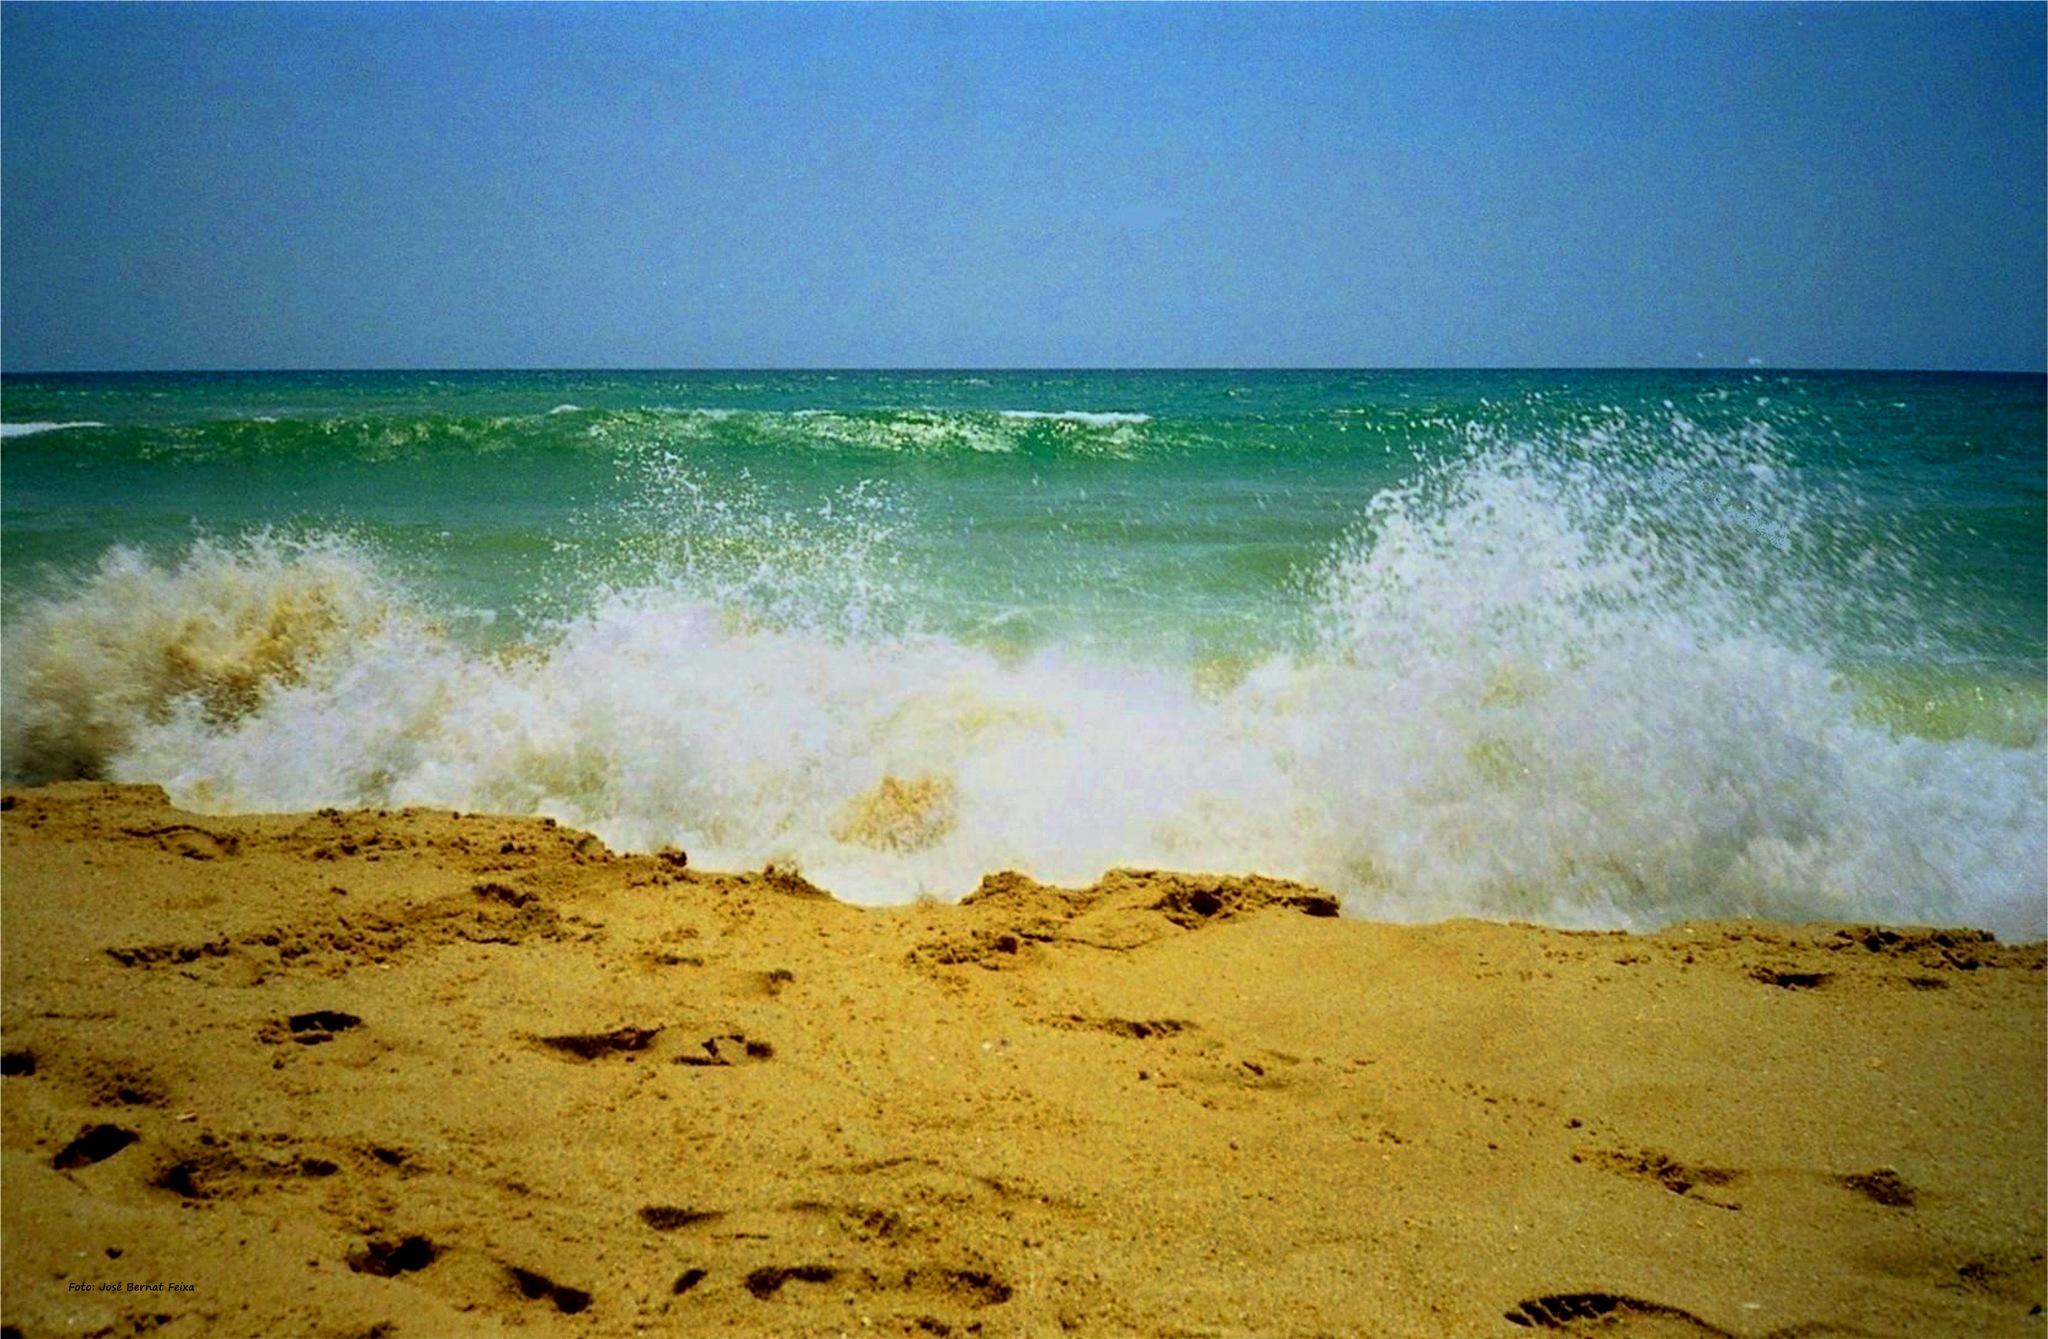 ARENA Y OLAS DEL MAR ; ZAND EN GOLVEN VAN DE ZEE ; SAND AND WAVES OF THE SEA by José Bernat Feixa